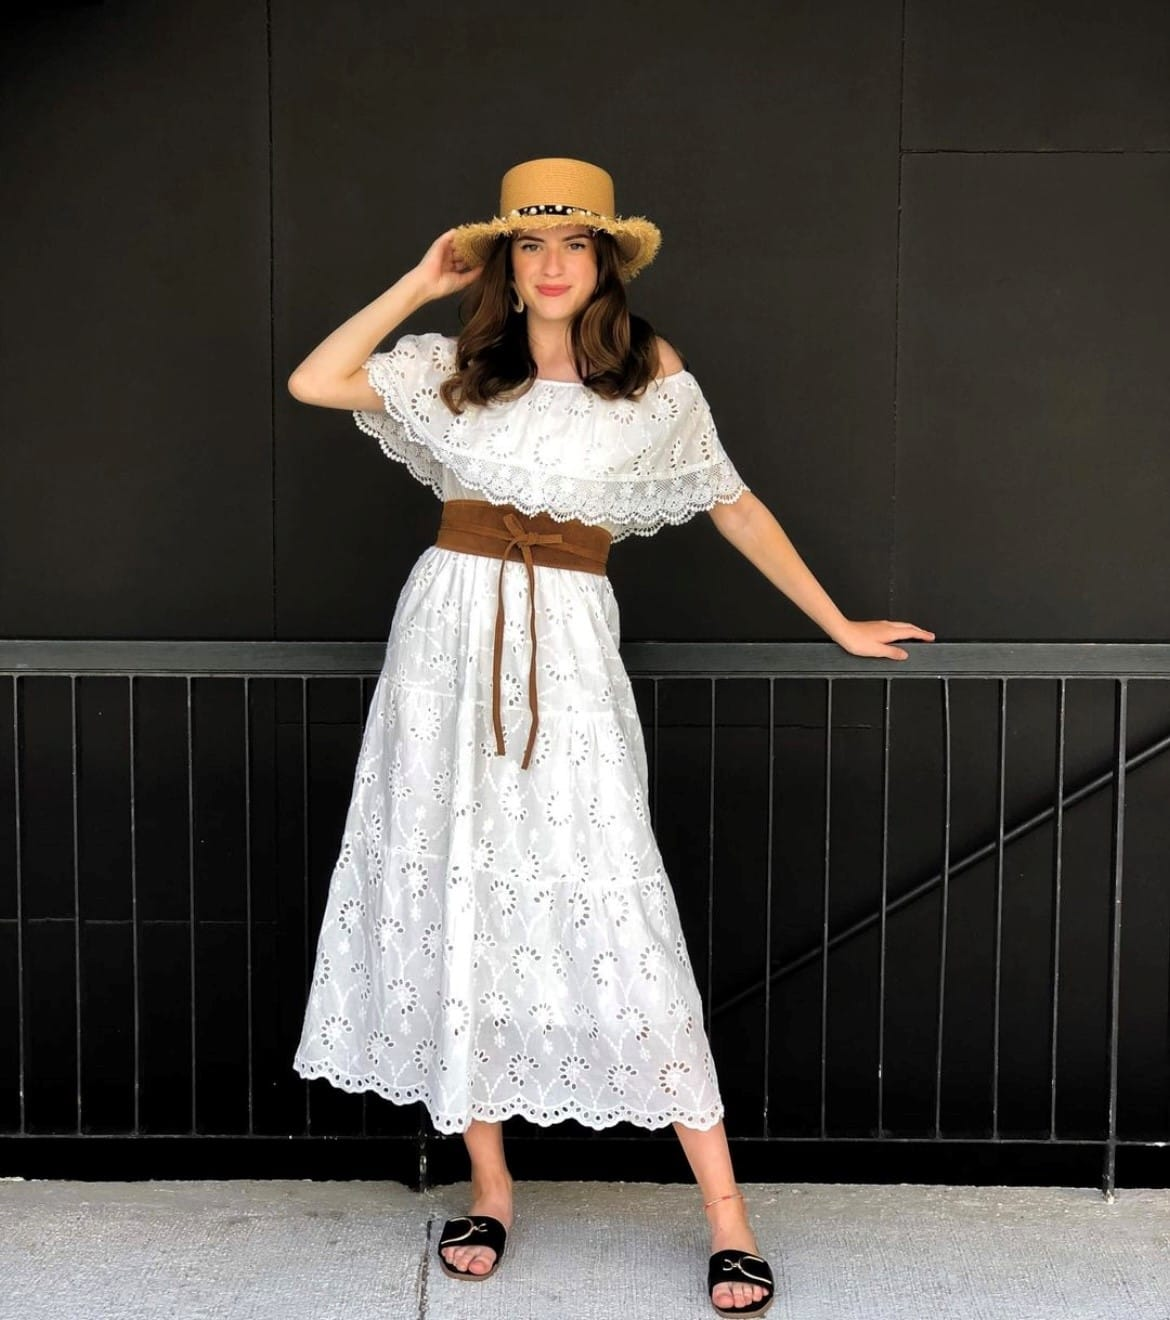 weißes Kleid, Maxikleid, Sommerkleid, Damenmode, Modetrends, Frühlingstrends 2021, 9020 Klagenfurt am Wörthersee